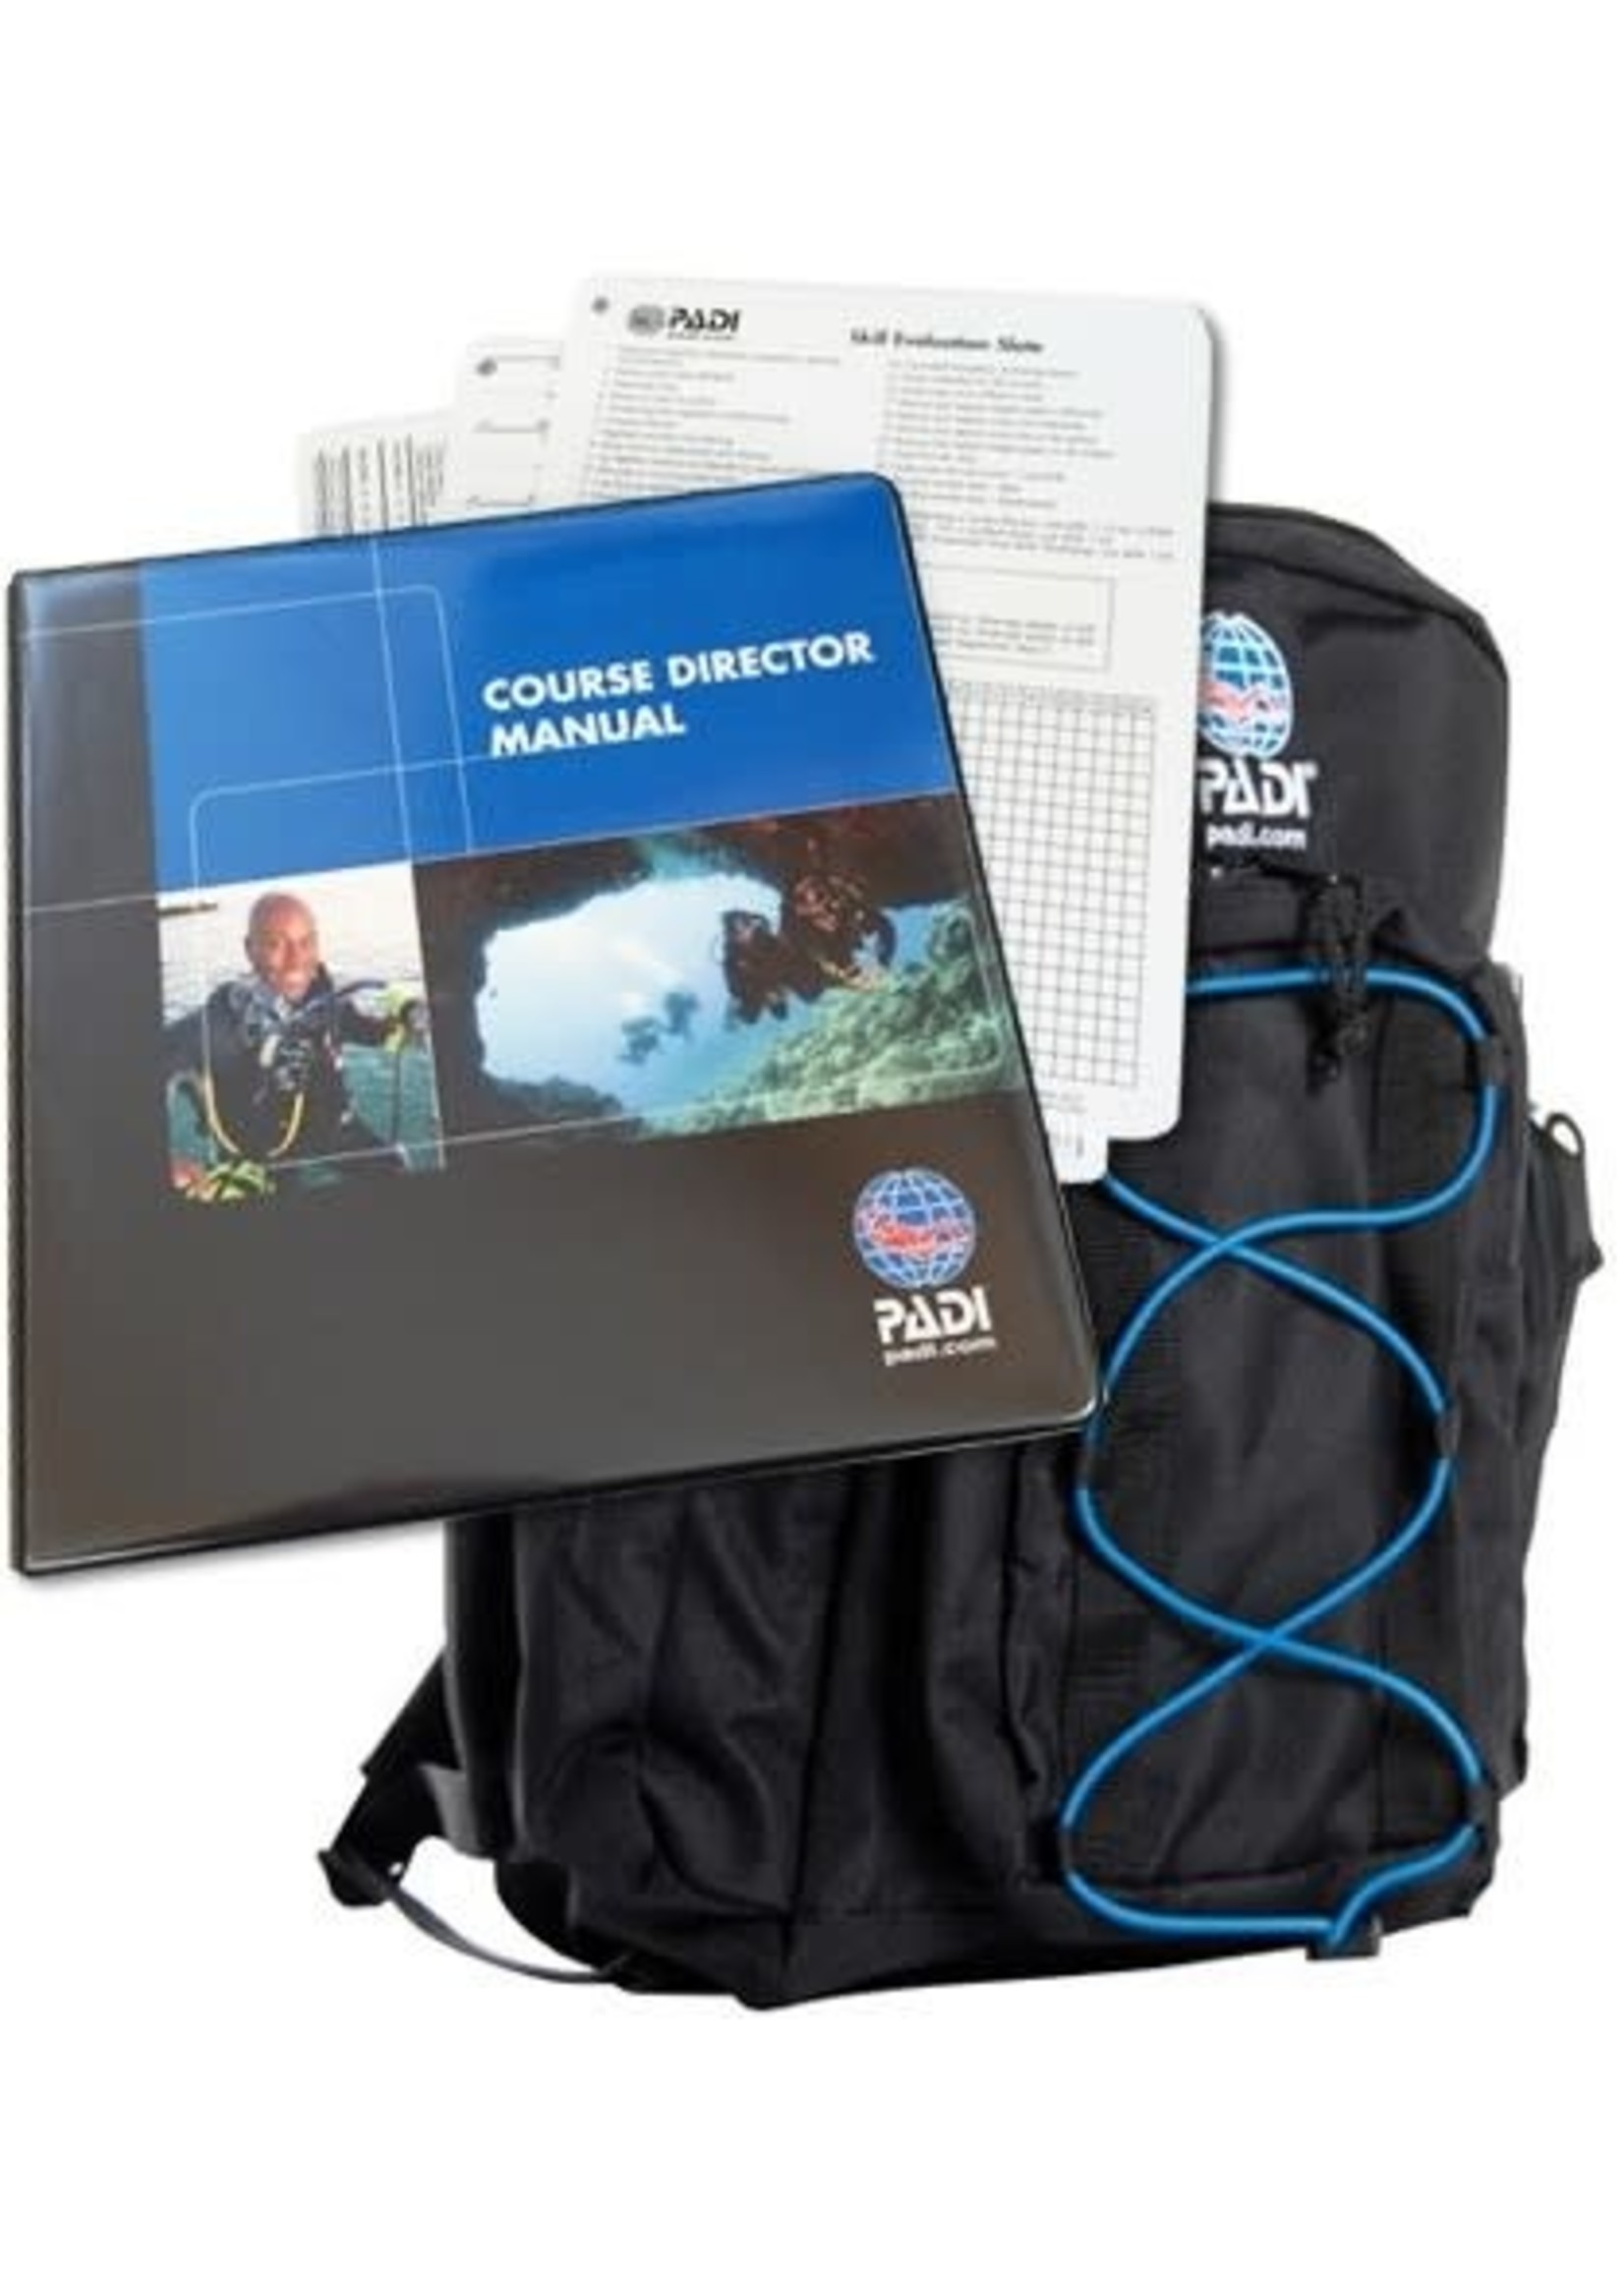 PADI Crewpak - IDC Staff Instructor